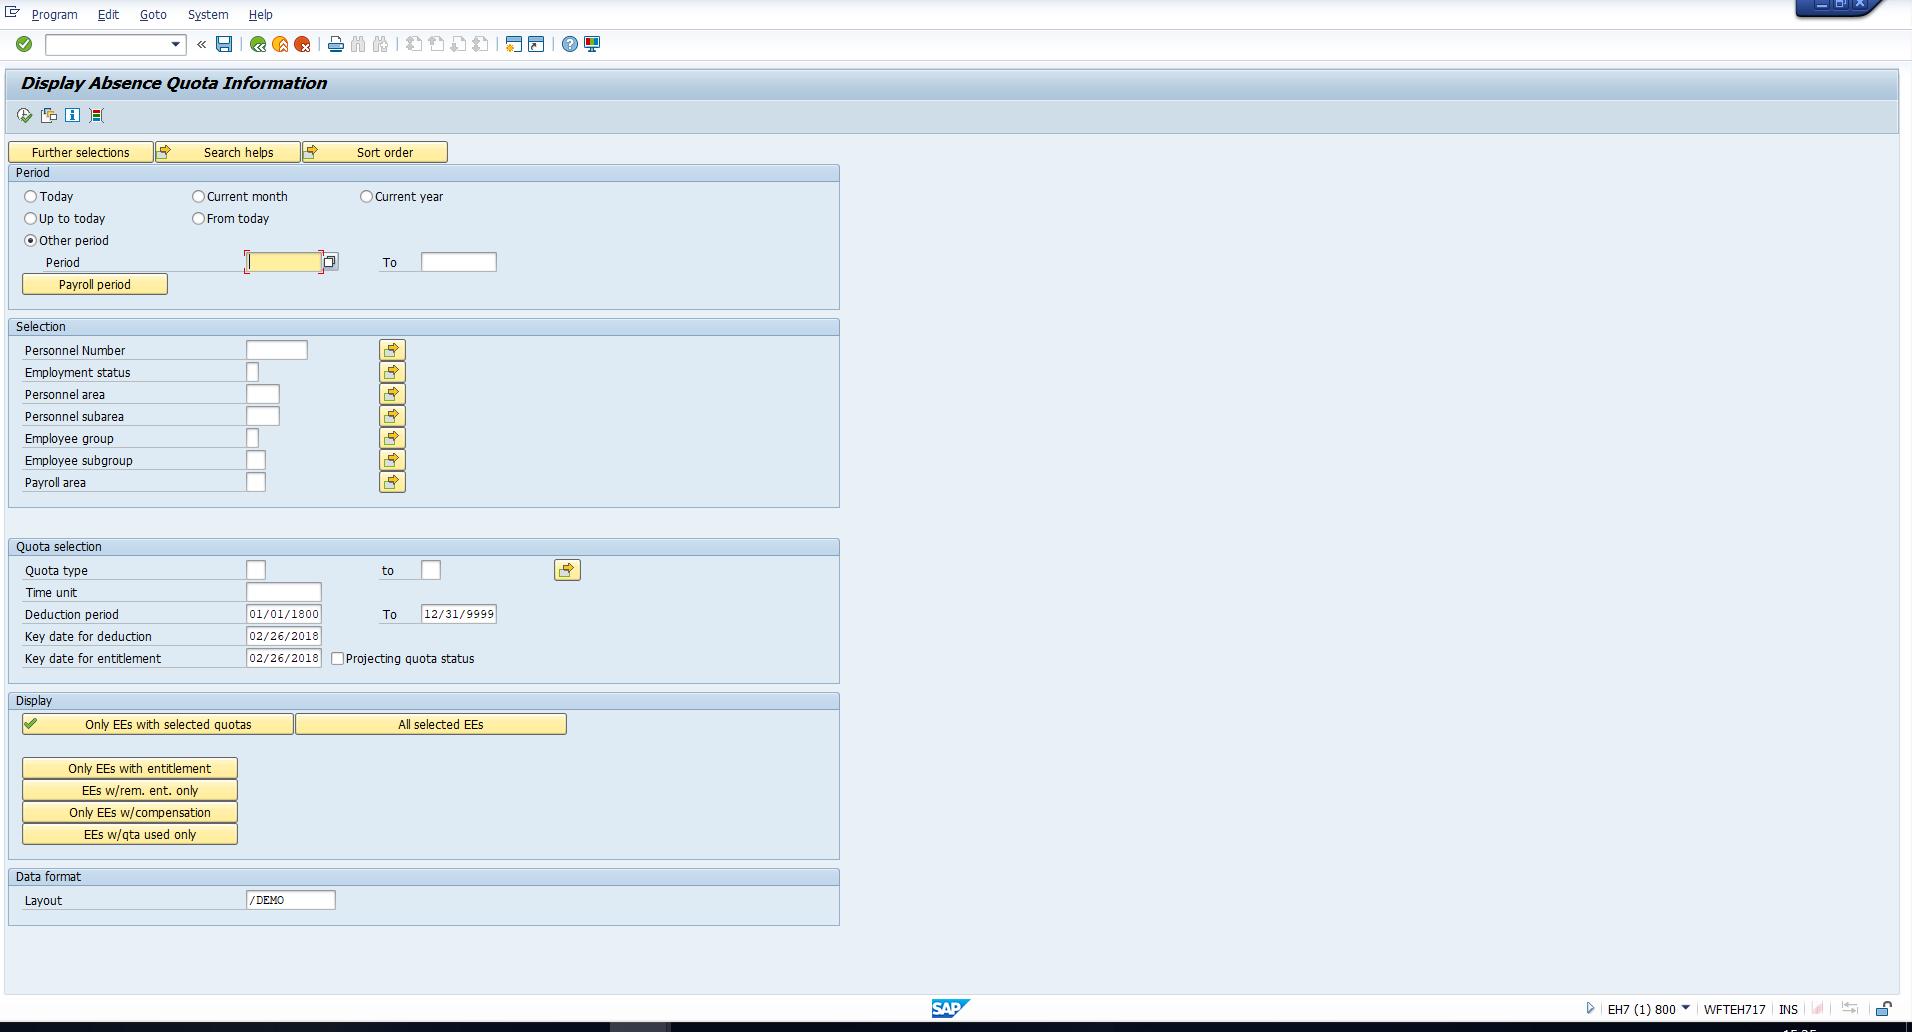 Figure 22: Selection Screen